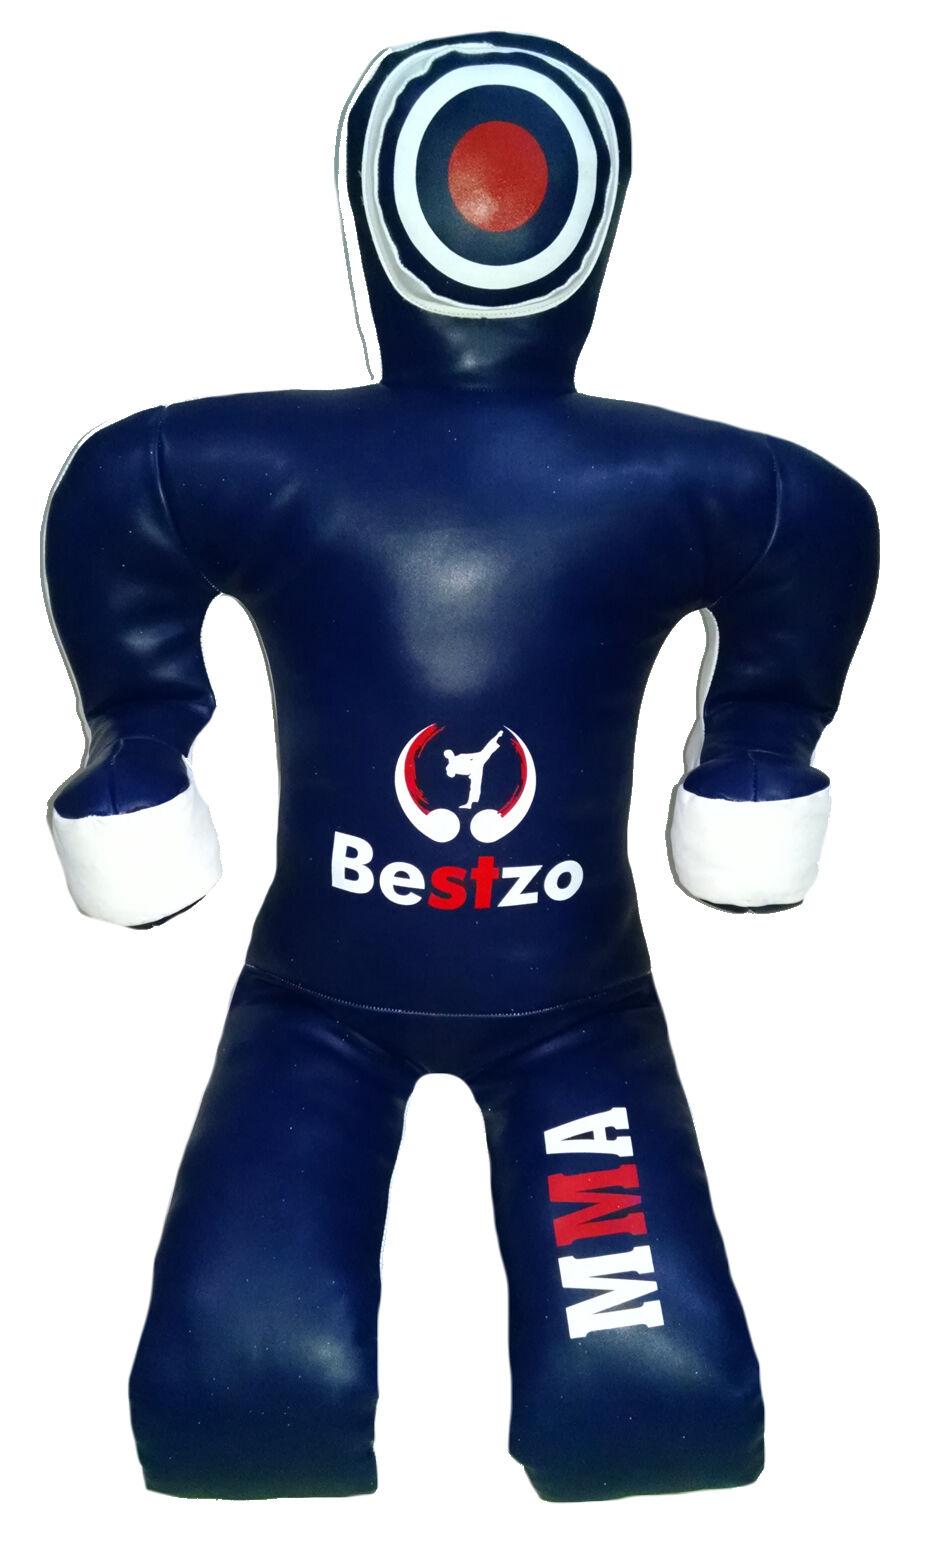 Bestzo MMA  Brazilian Wrestling Grappling Dummy Sitting Position blueee 70in (6 ft)  comfortable